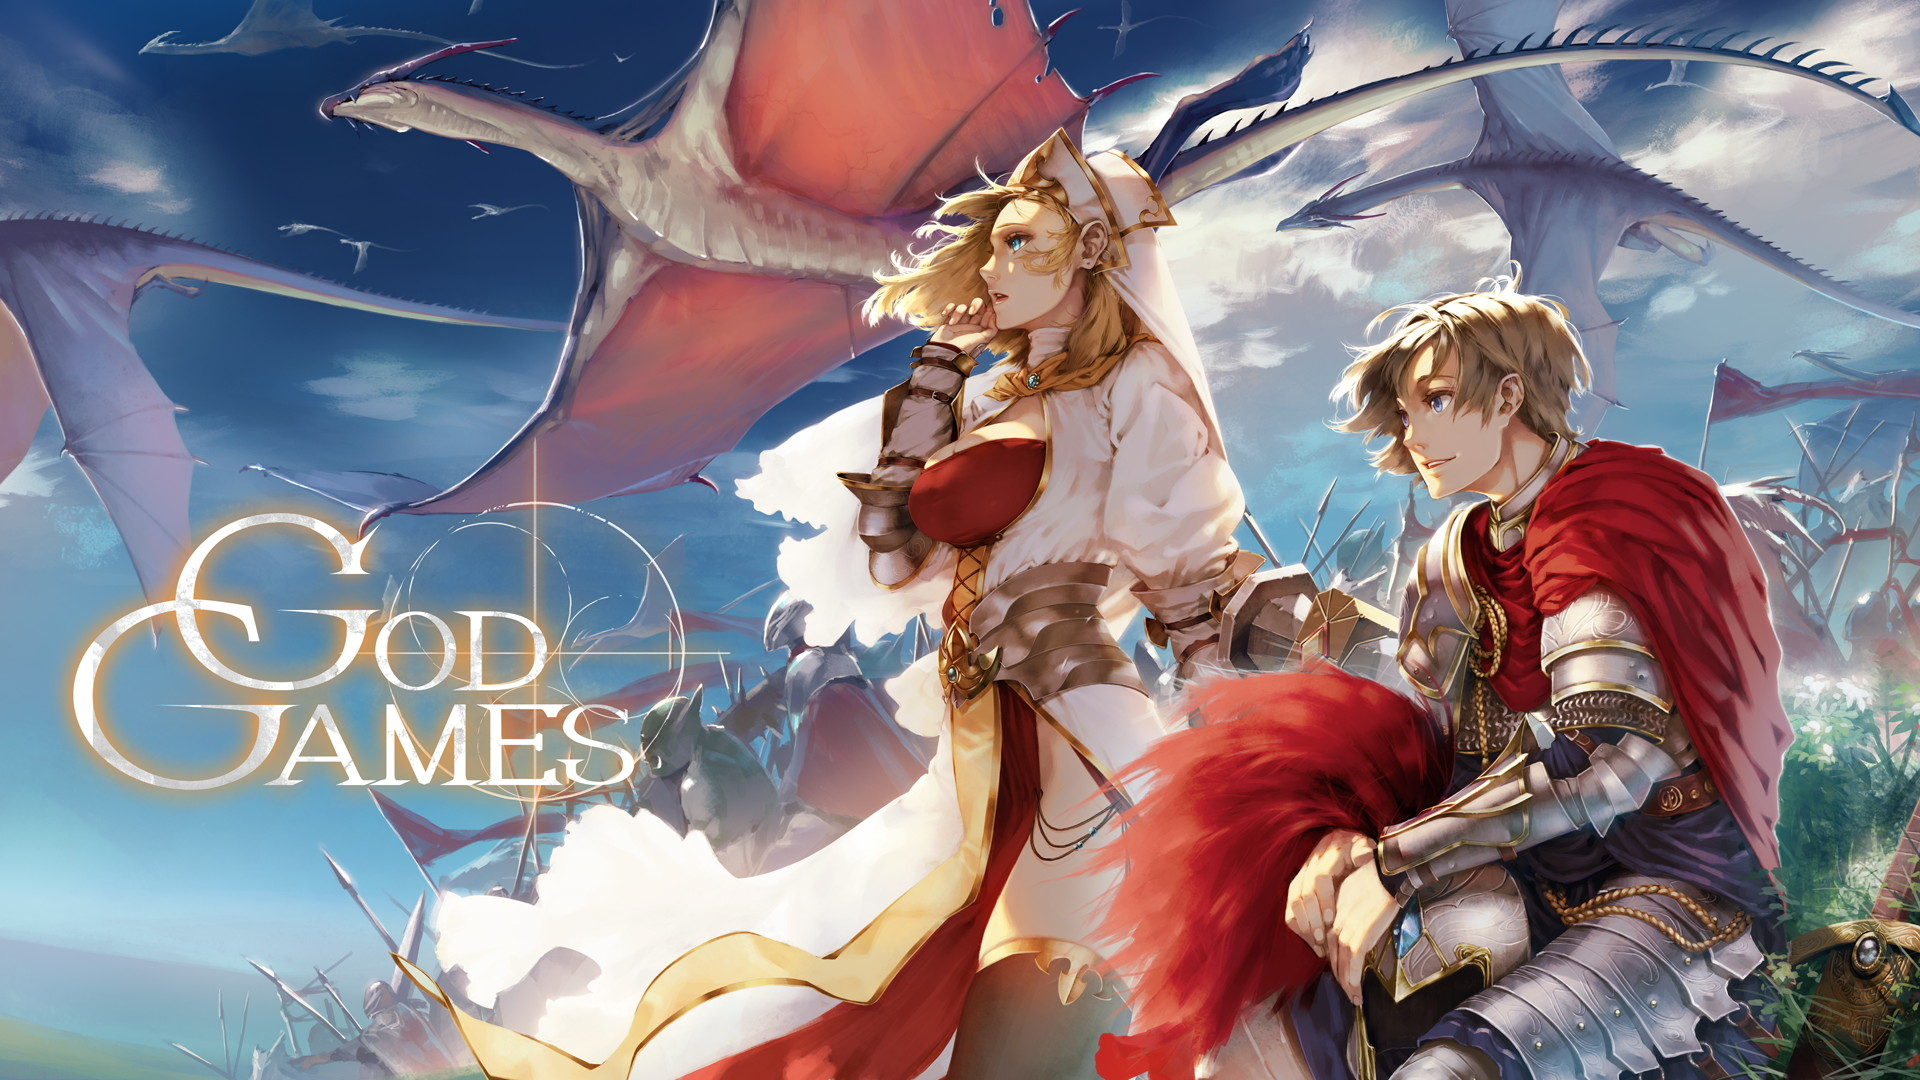 『GODGAMES』が大型アップデート! 「アーサー王シリーズ」や新ギミックが登場するマップ「山脈回廊」が登場